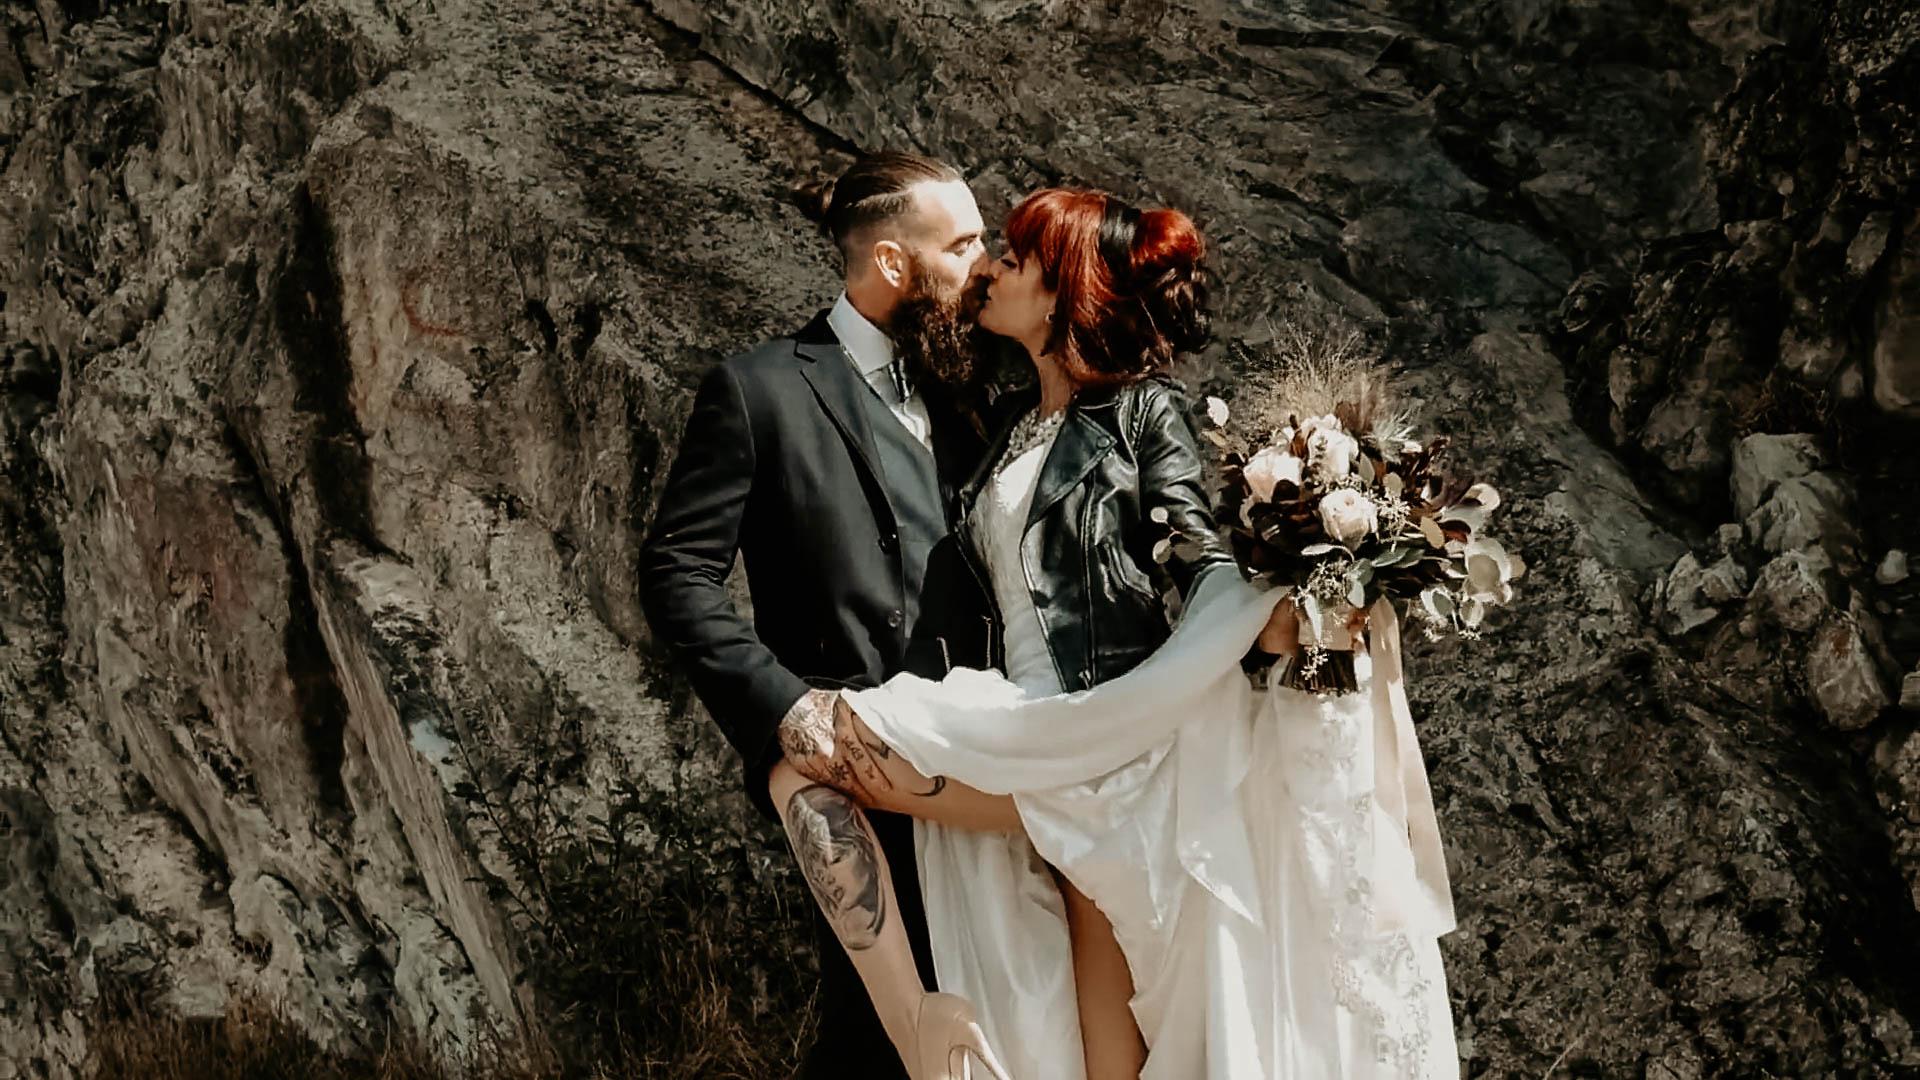 Brisbane Wedding Videographer and Photographer